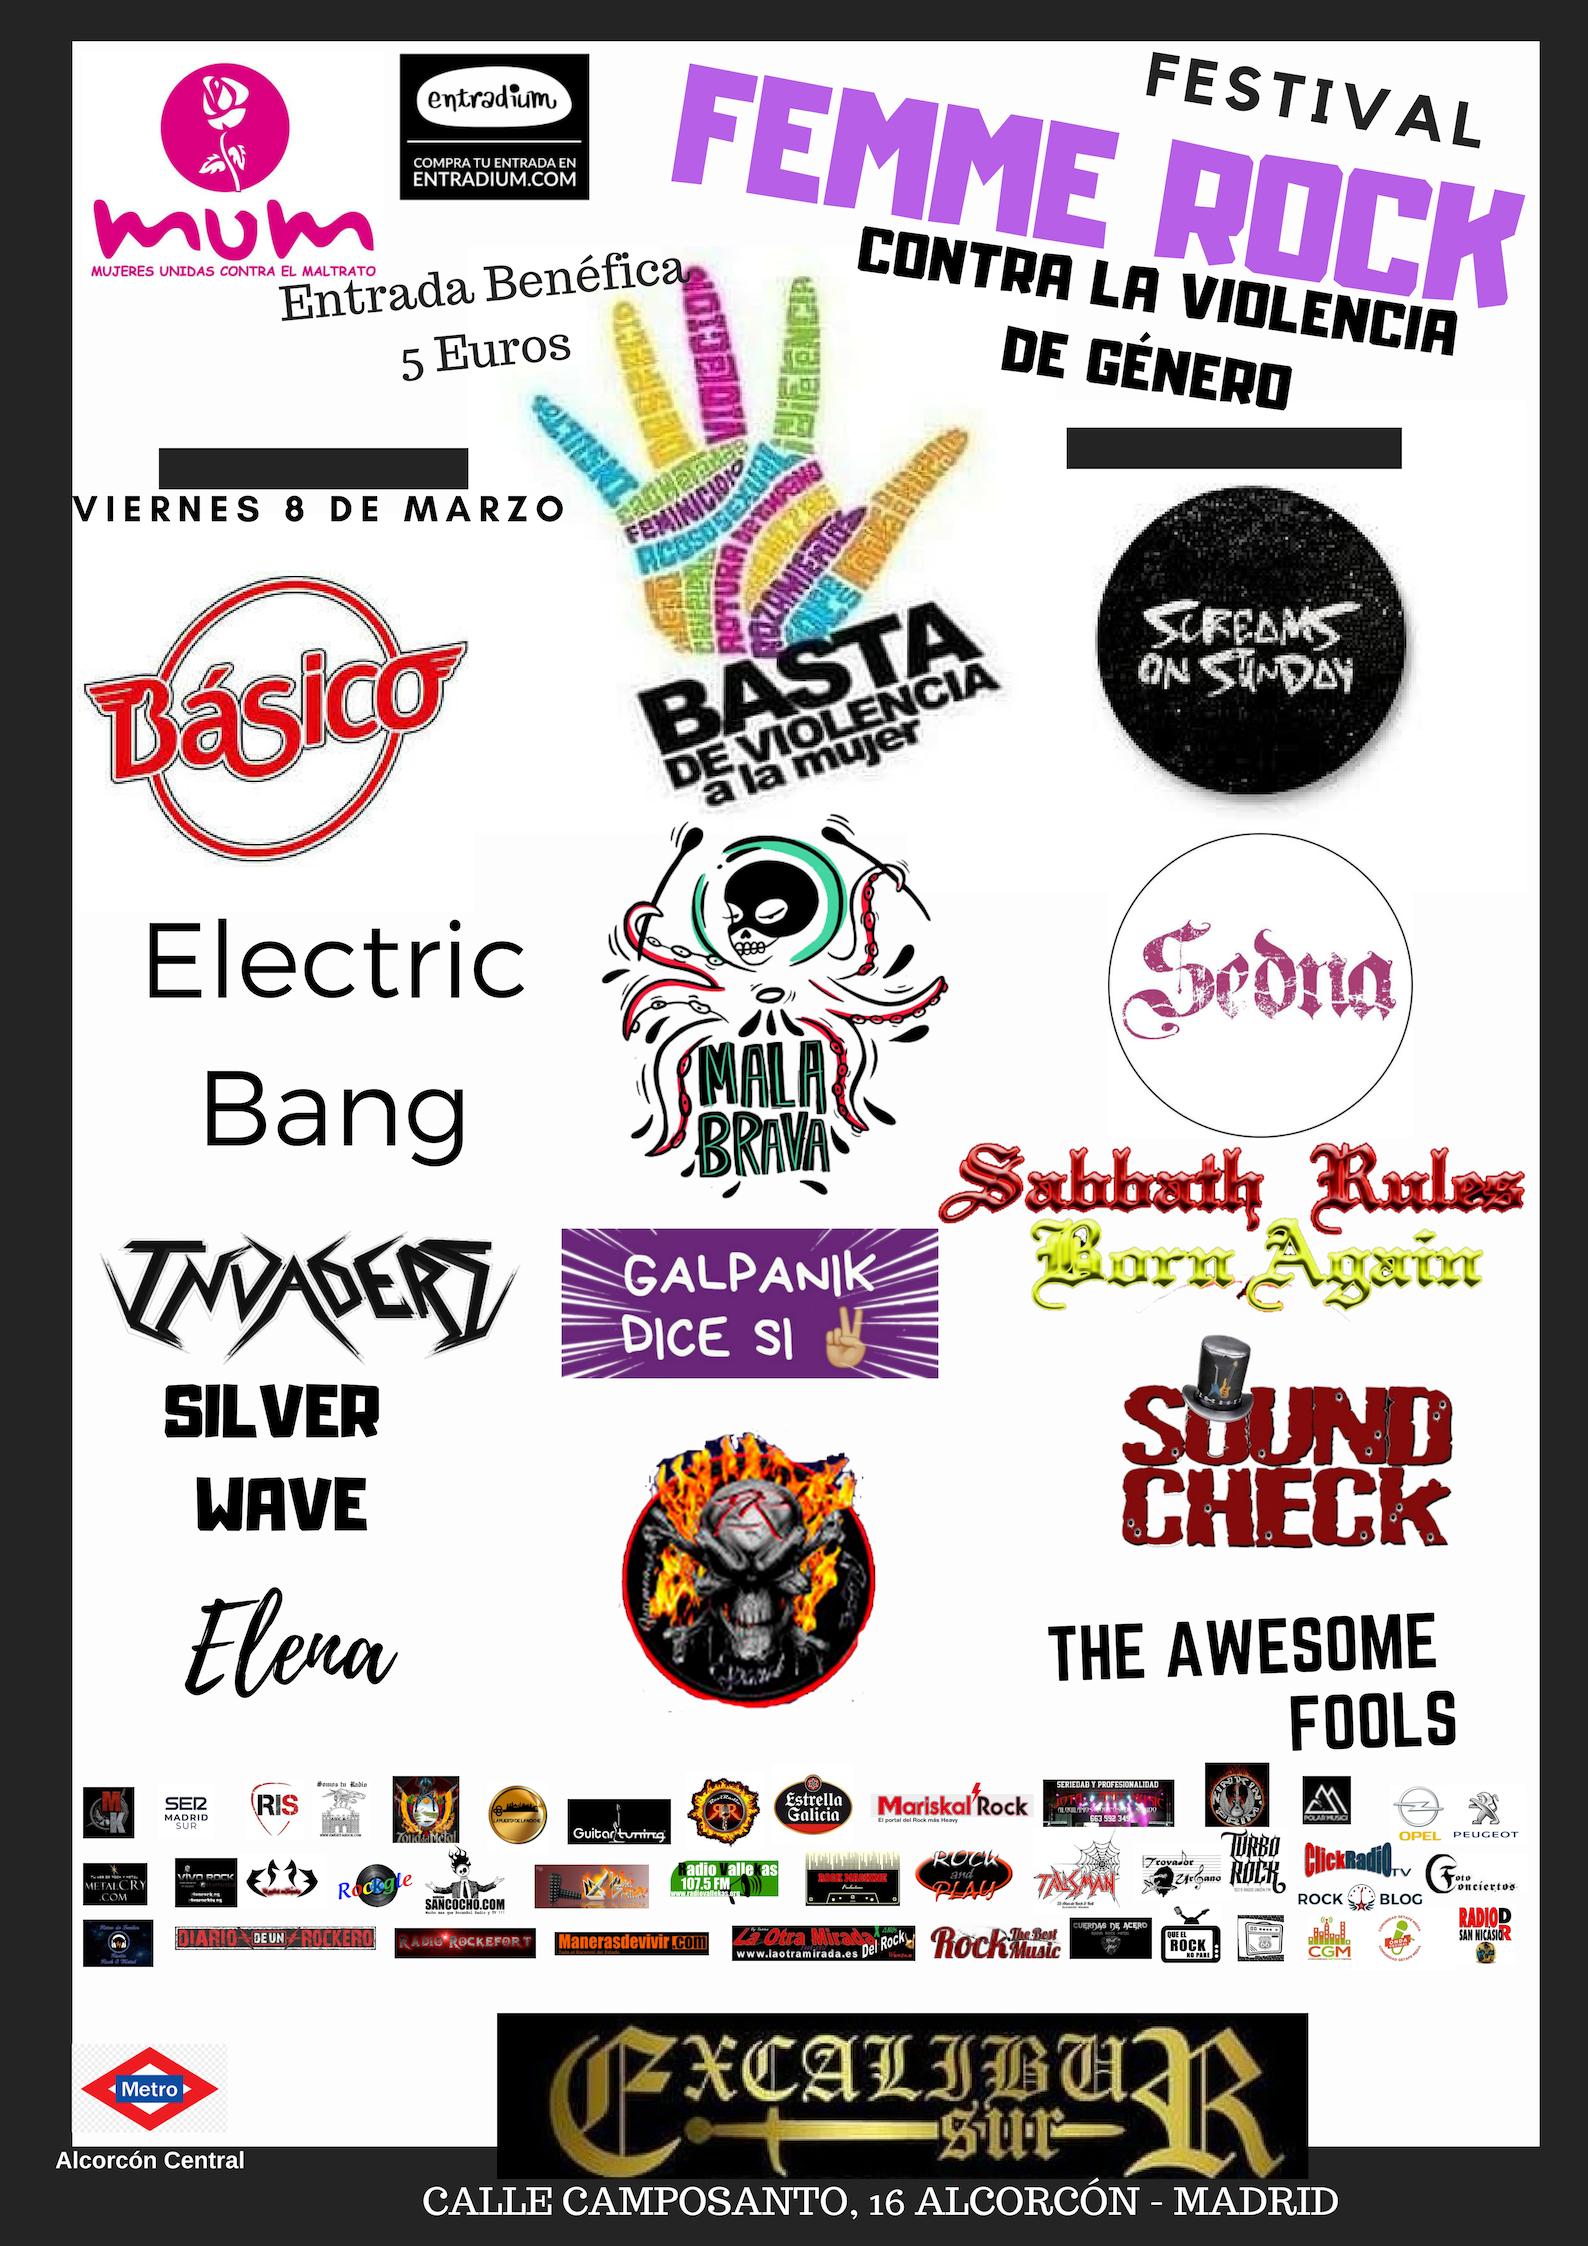 Festival Femme Rock - Viernes 8 de marzo.